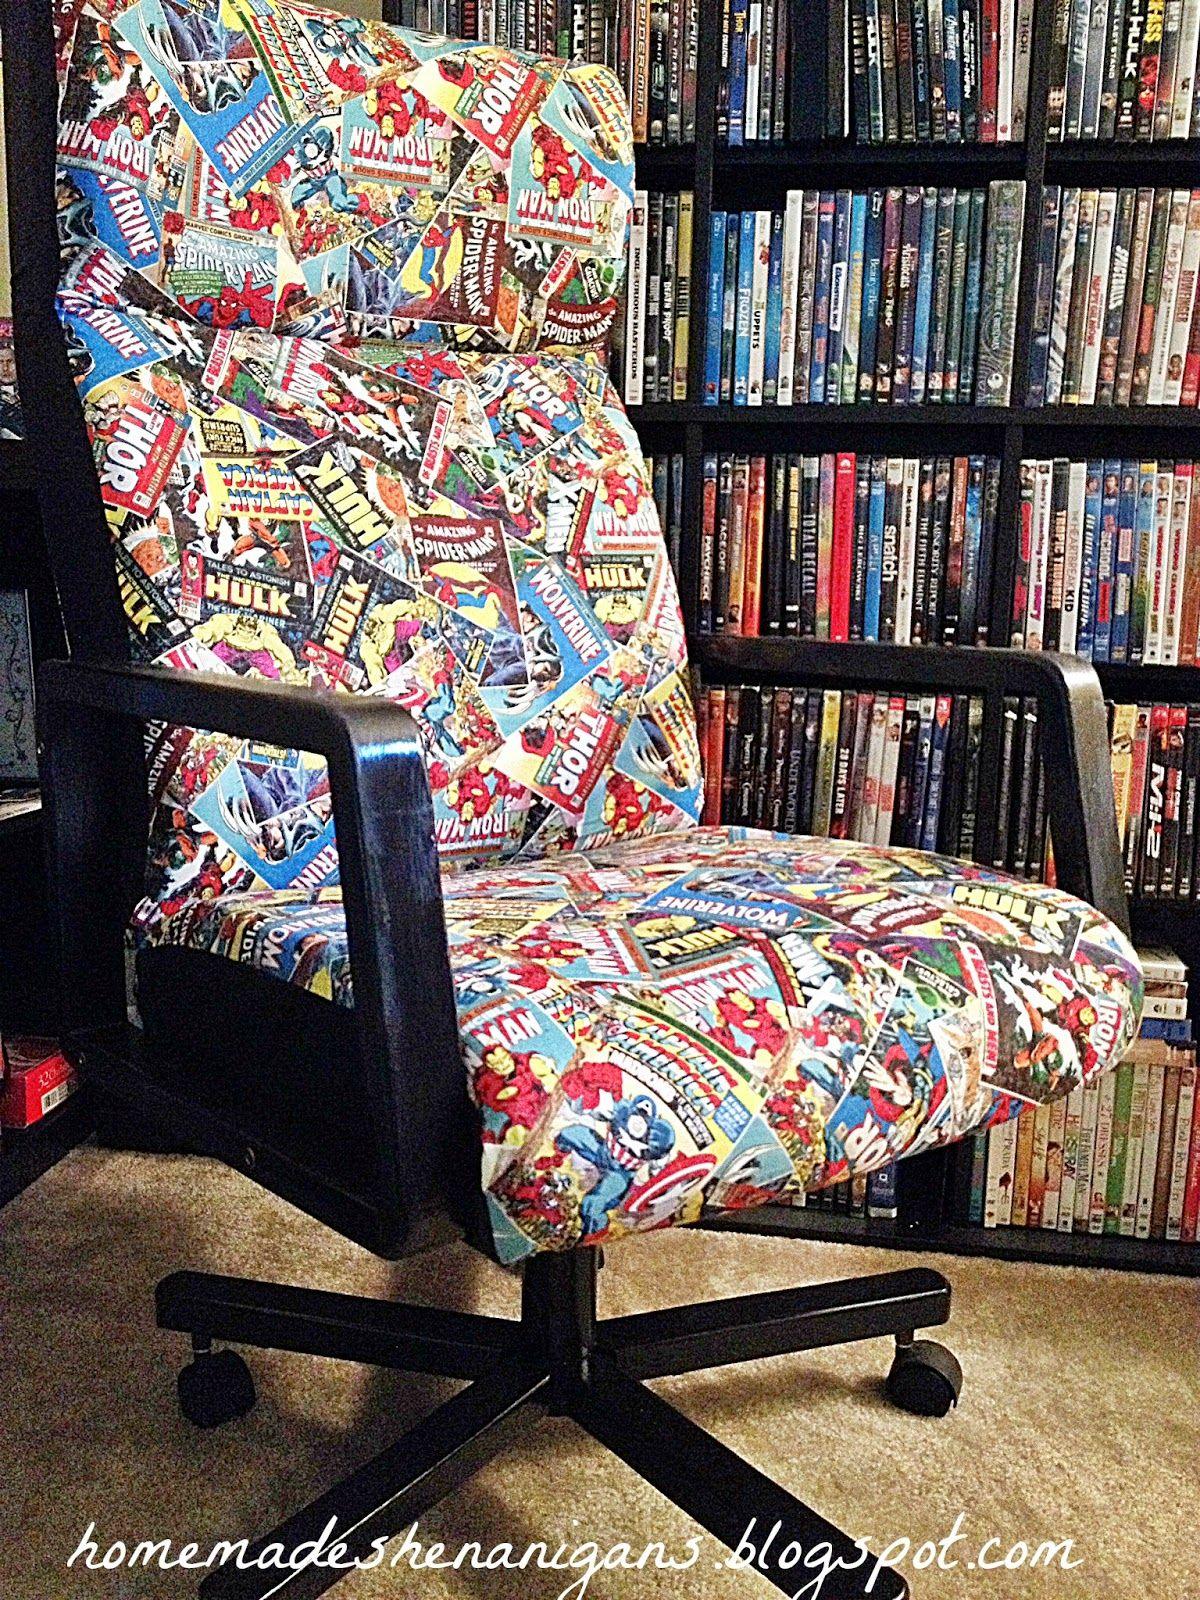 Homemade Shenanigans Superhero Desk Chair Furniture